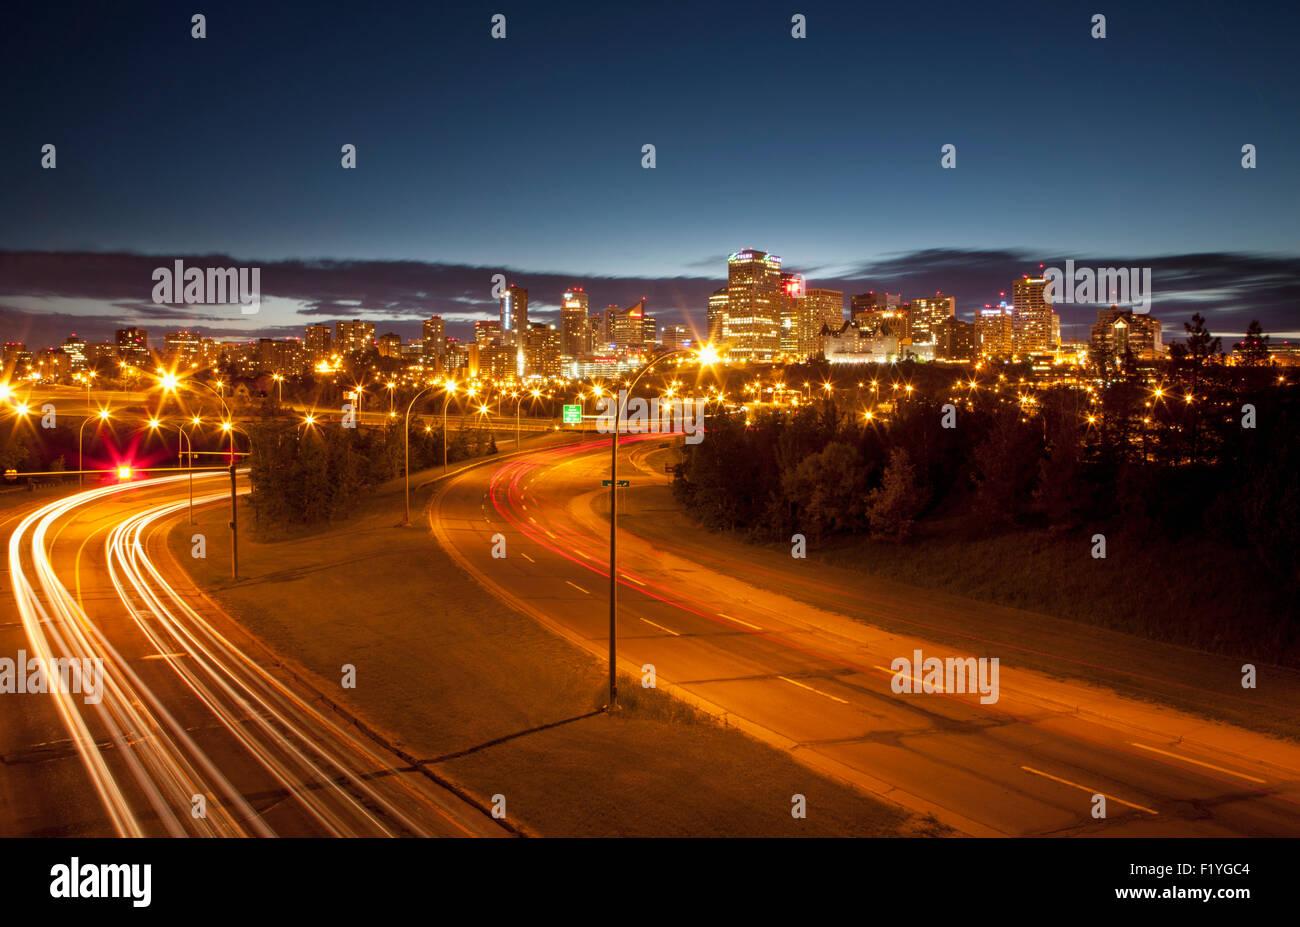 Road,Street Light,Light Trail,Edmonton,City - Stock Image